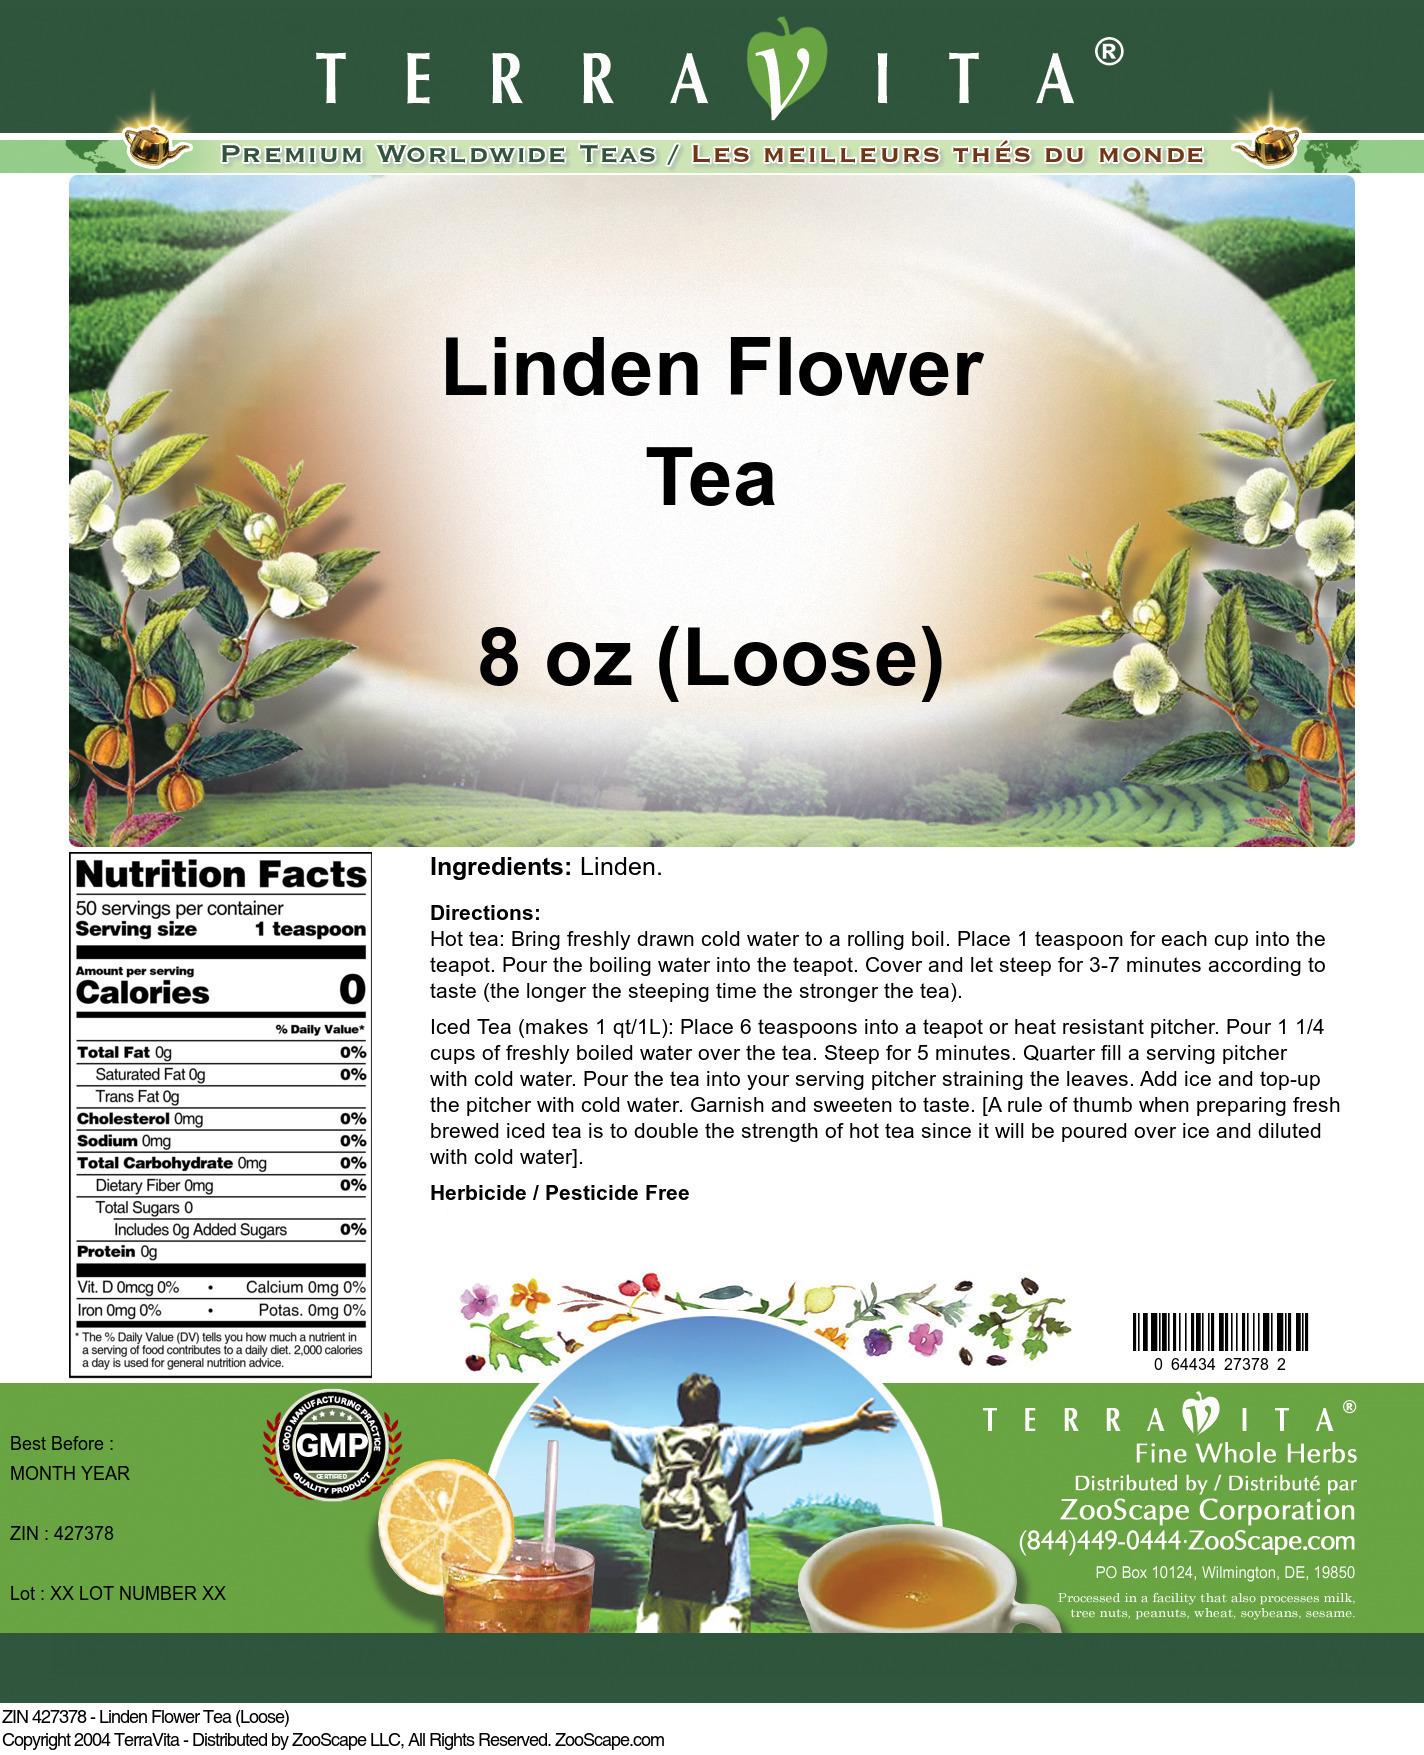 Linden Flower Tea (Loose)